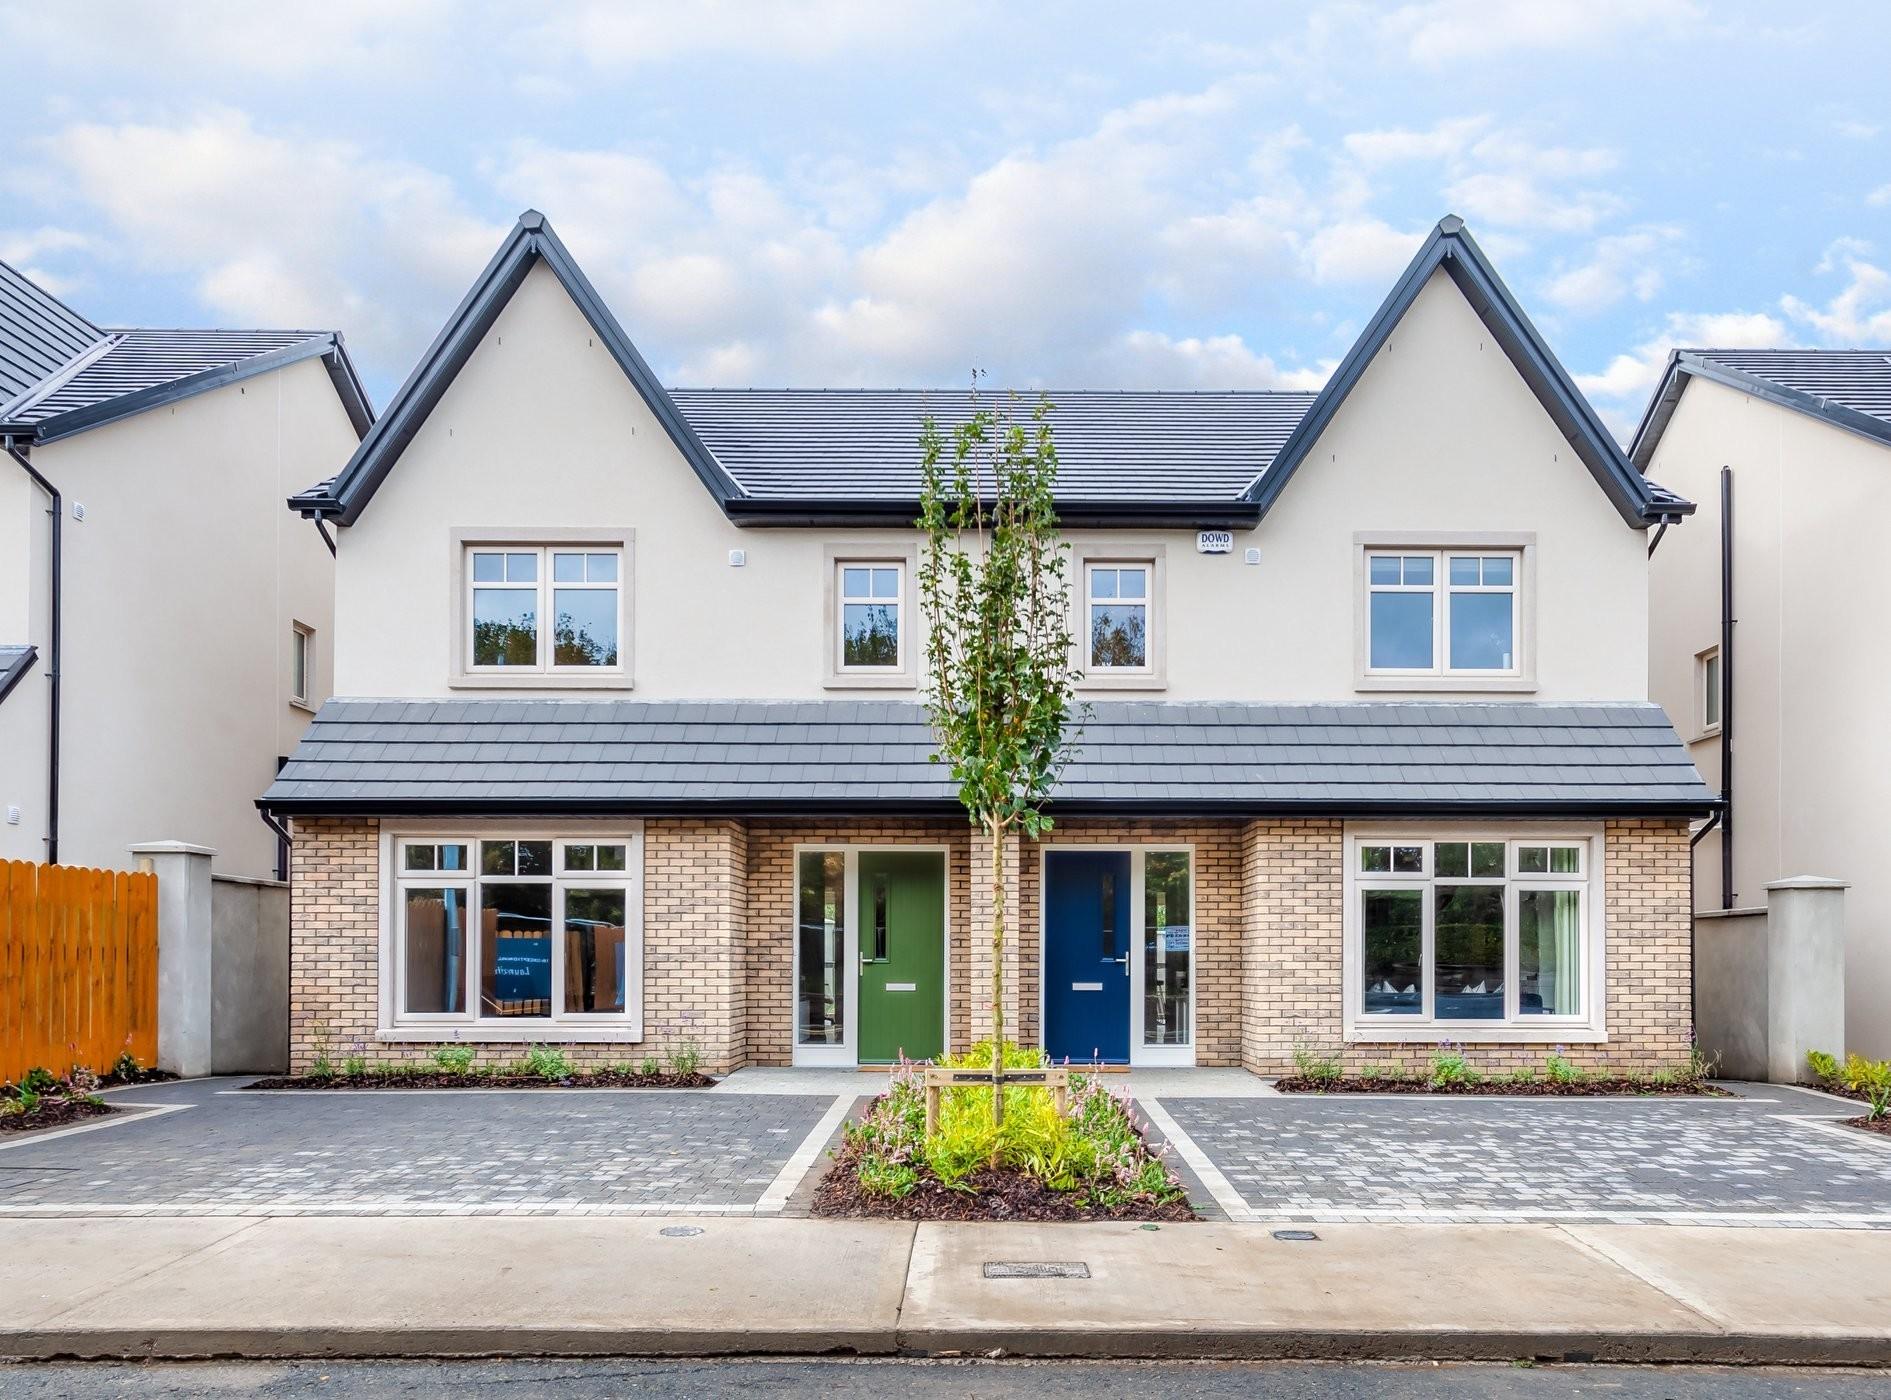 Ireland's premier residential property developers